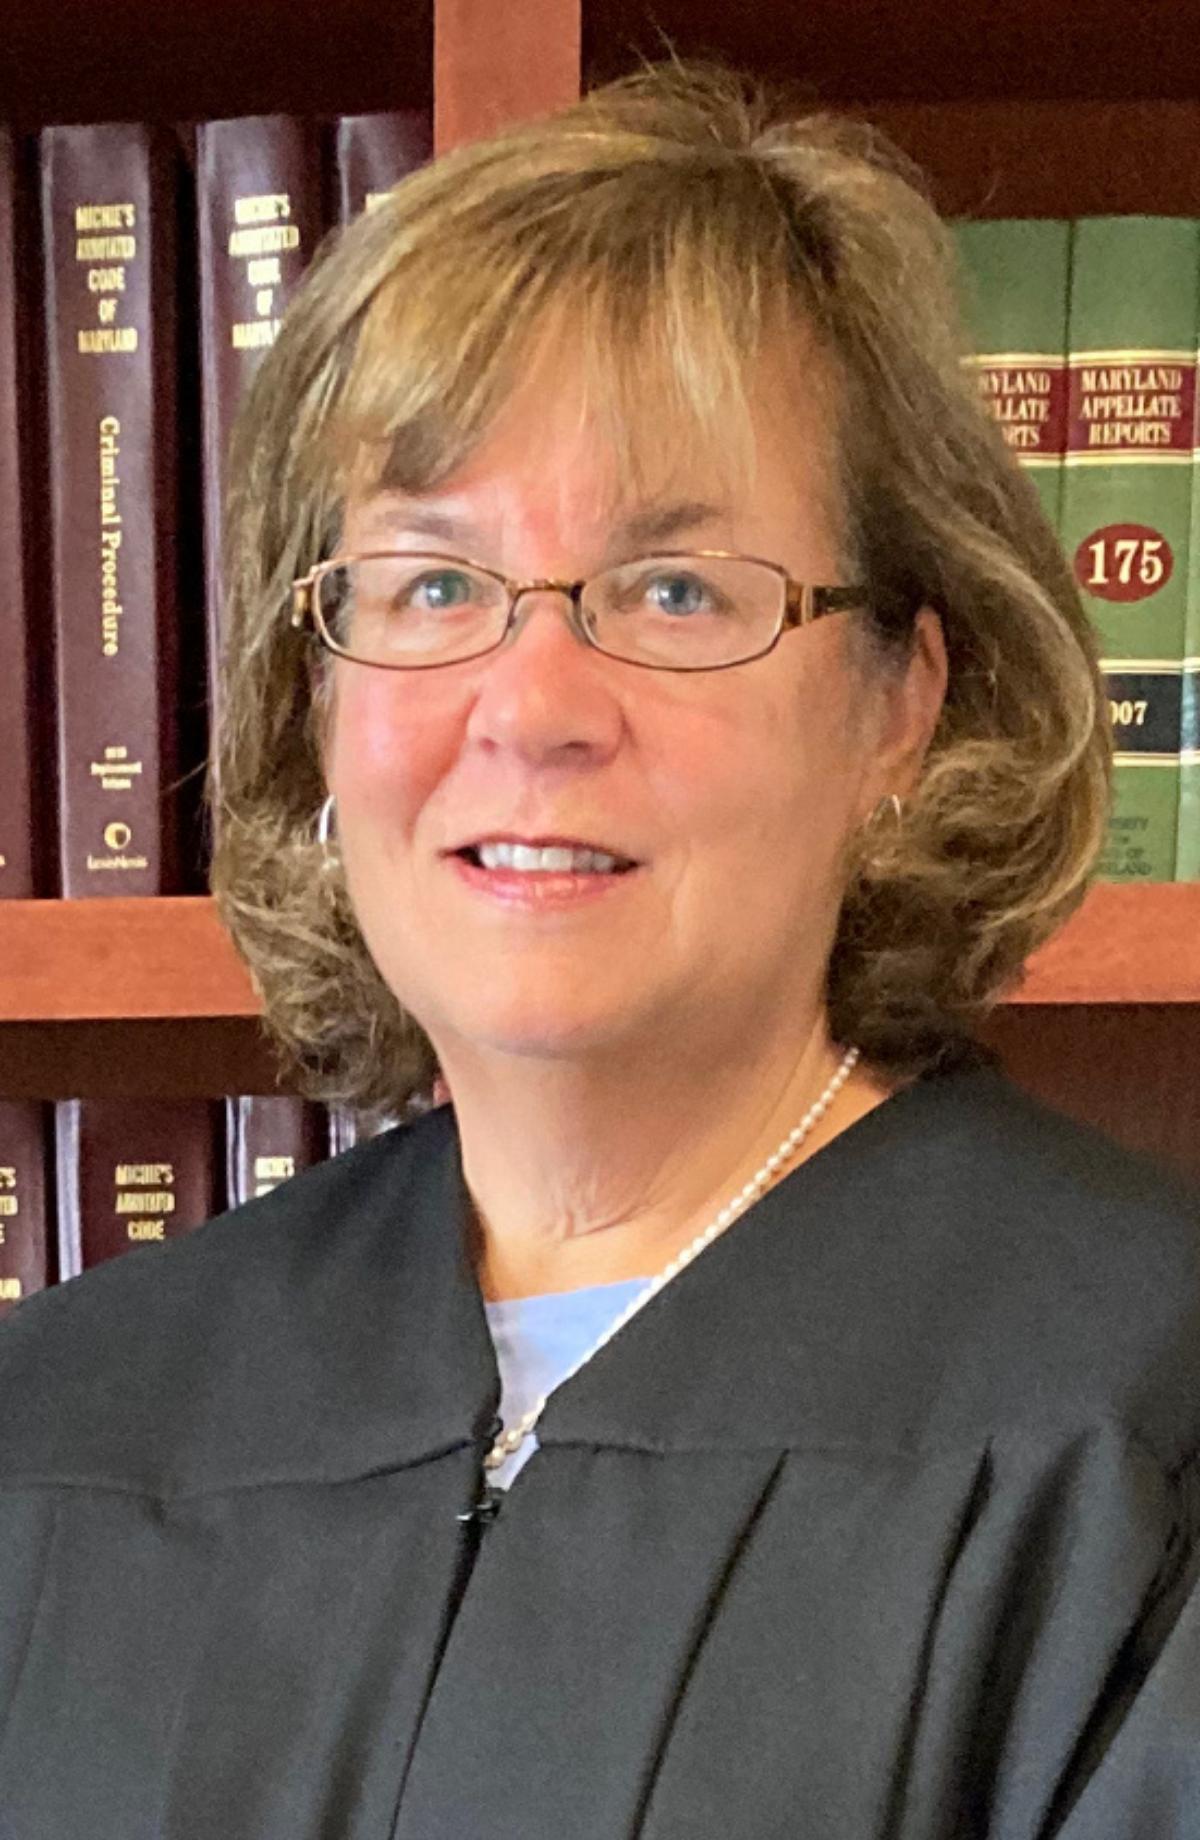 Headshot of Judge Judith Ensor